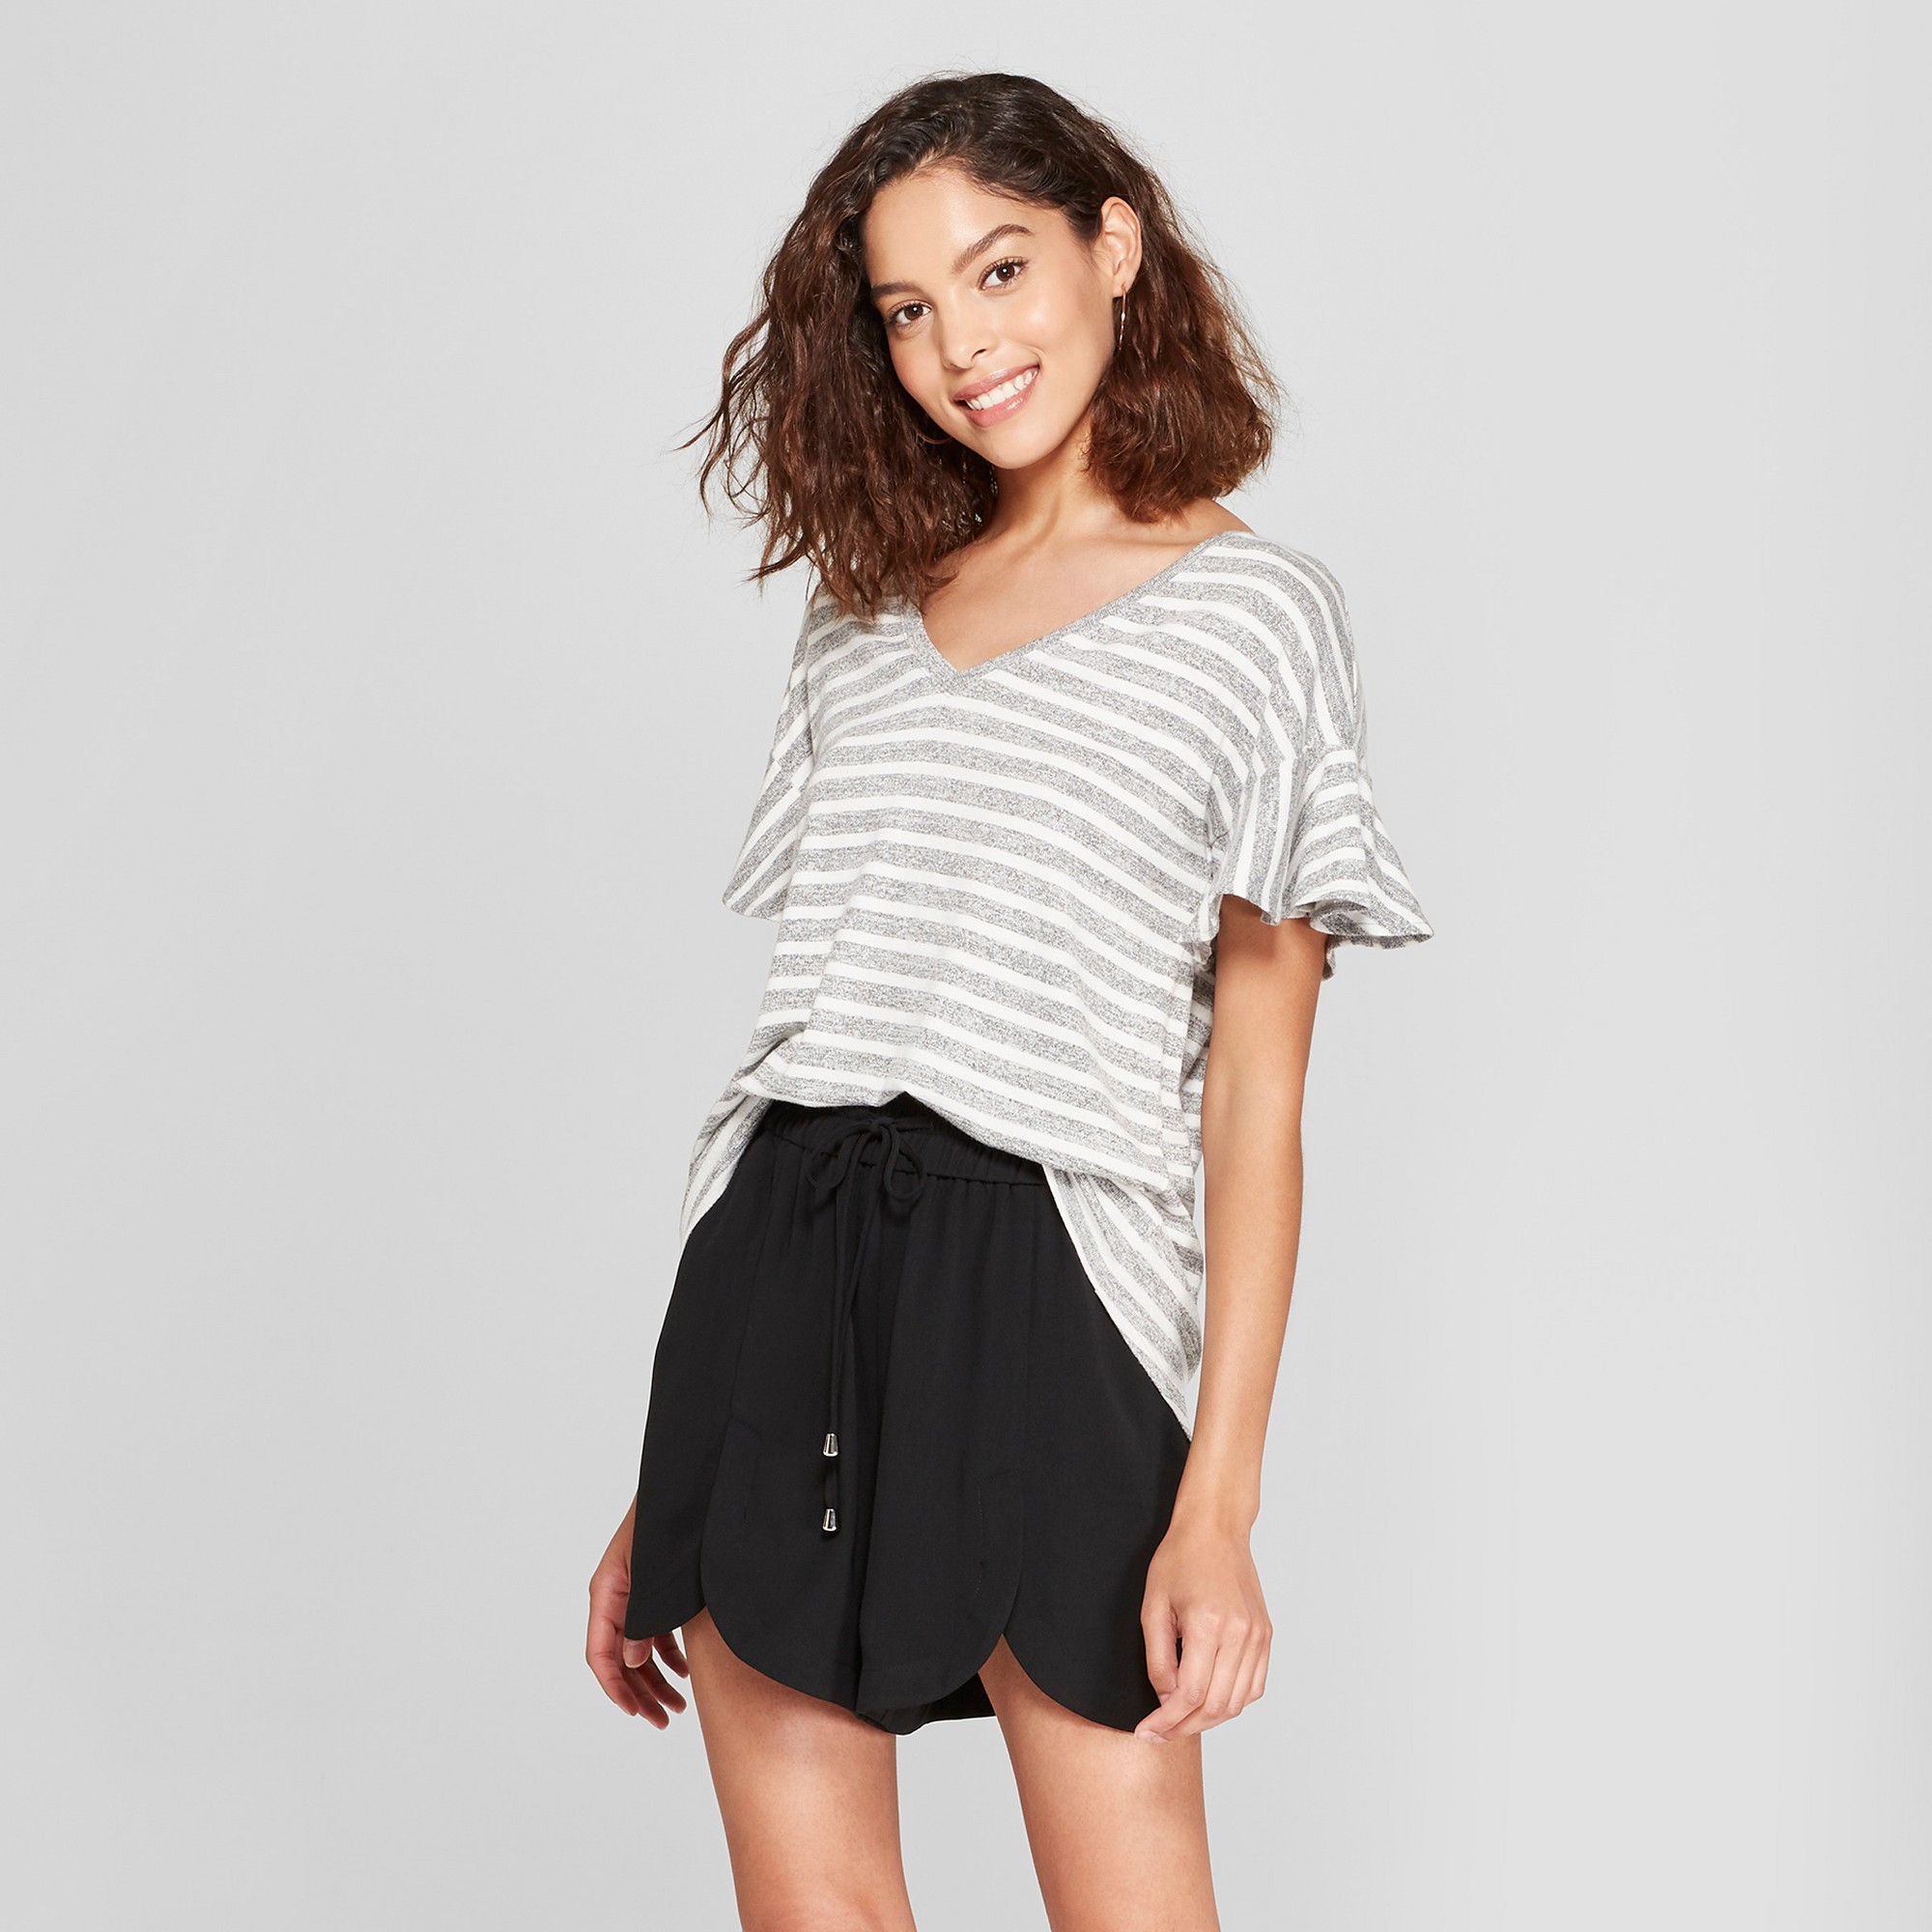 ee0a35dc7aa8c3 Women s Striped Ruffle Sleeve T-Shirt - A New Day Gray White Xxl ...